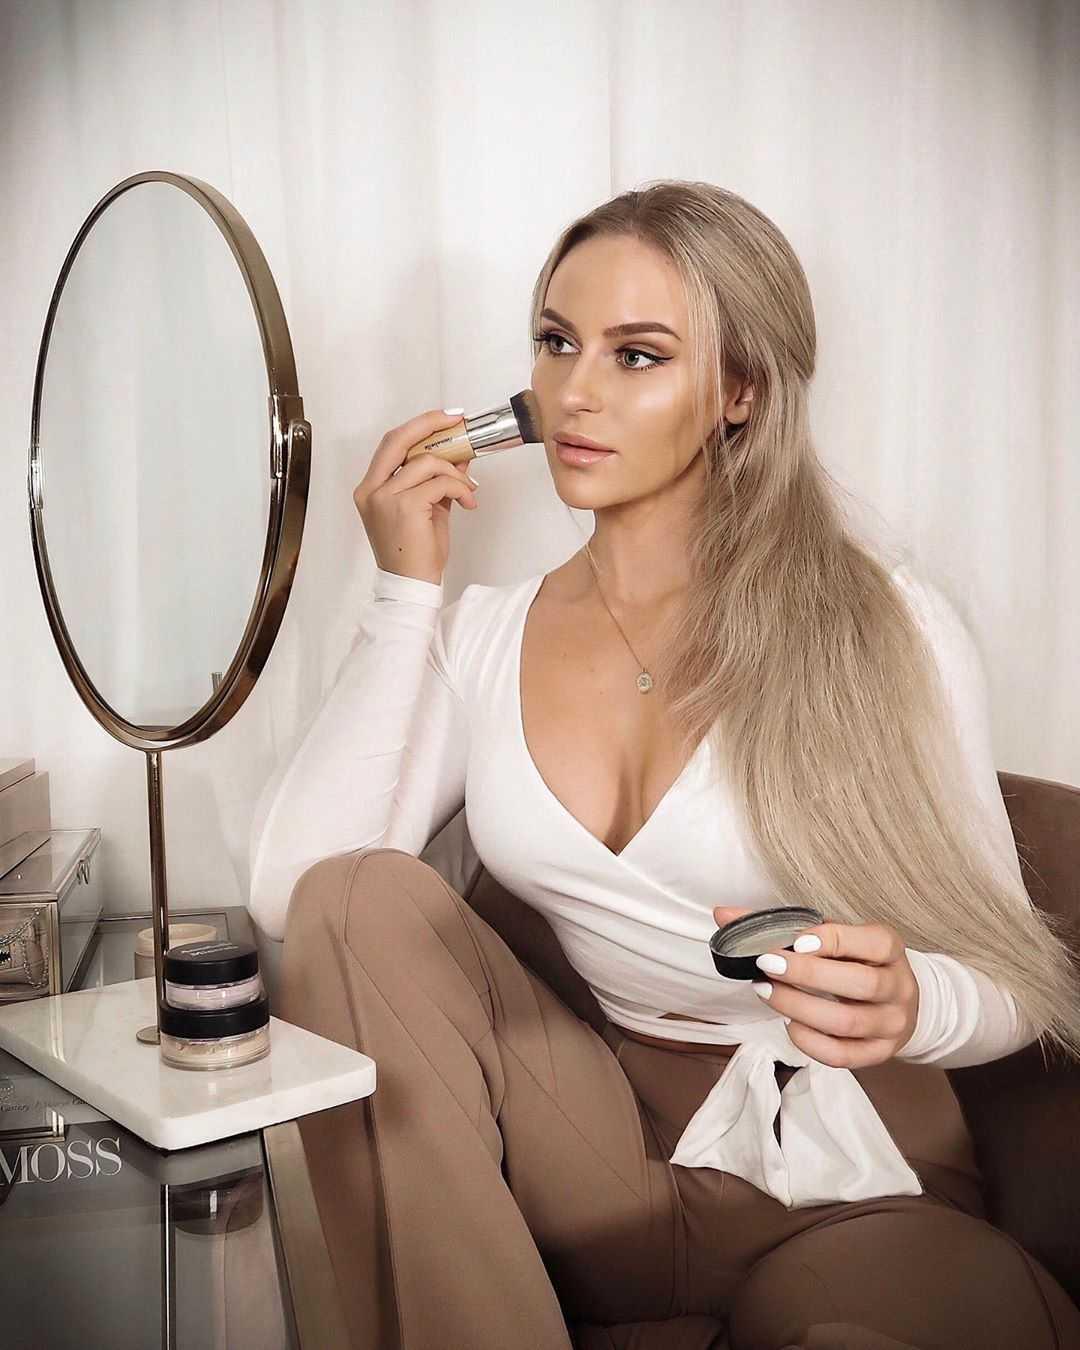 Anna Nyström sexy side boobs pics